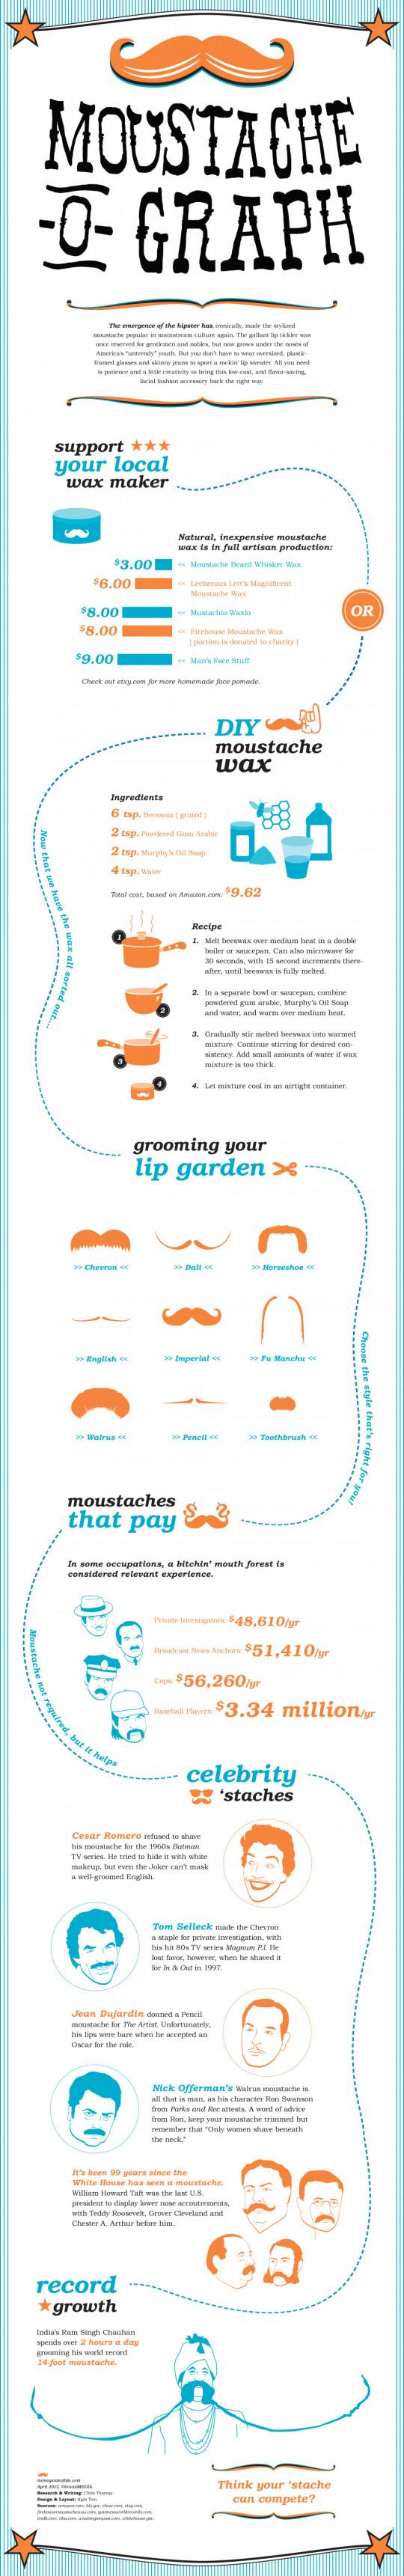 Moustache-o-graph